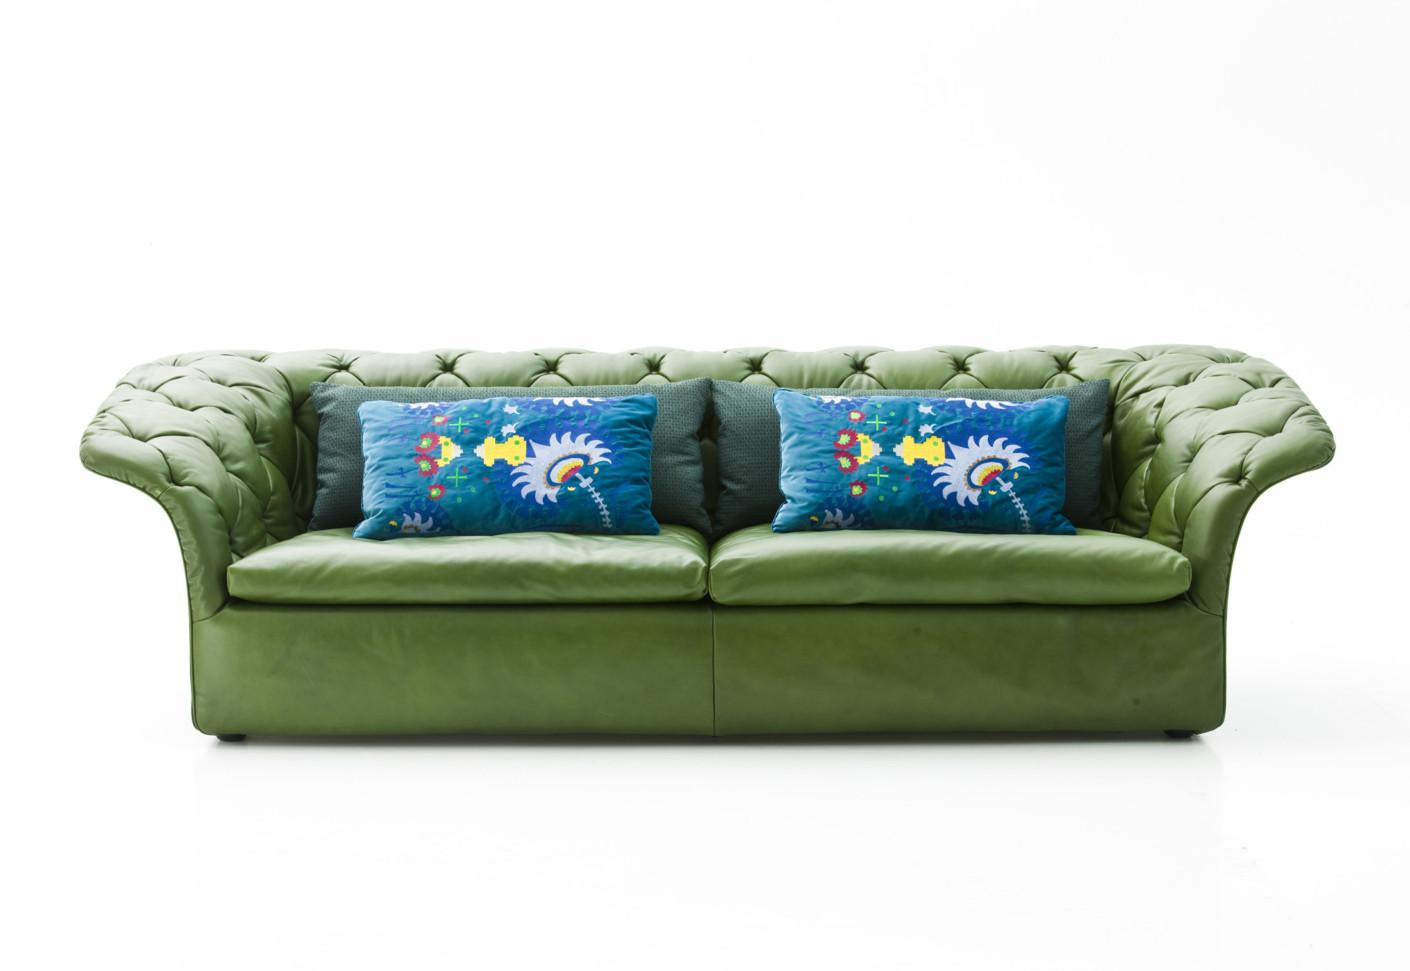 Bohemian sofa by Moroso  STYLEPARK